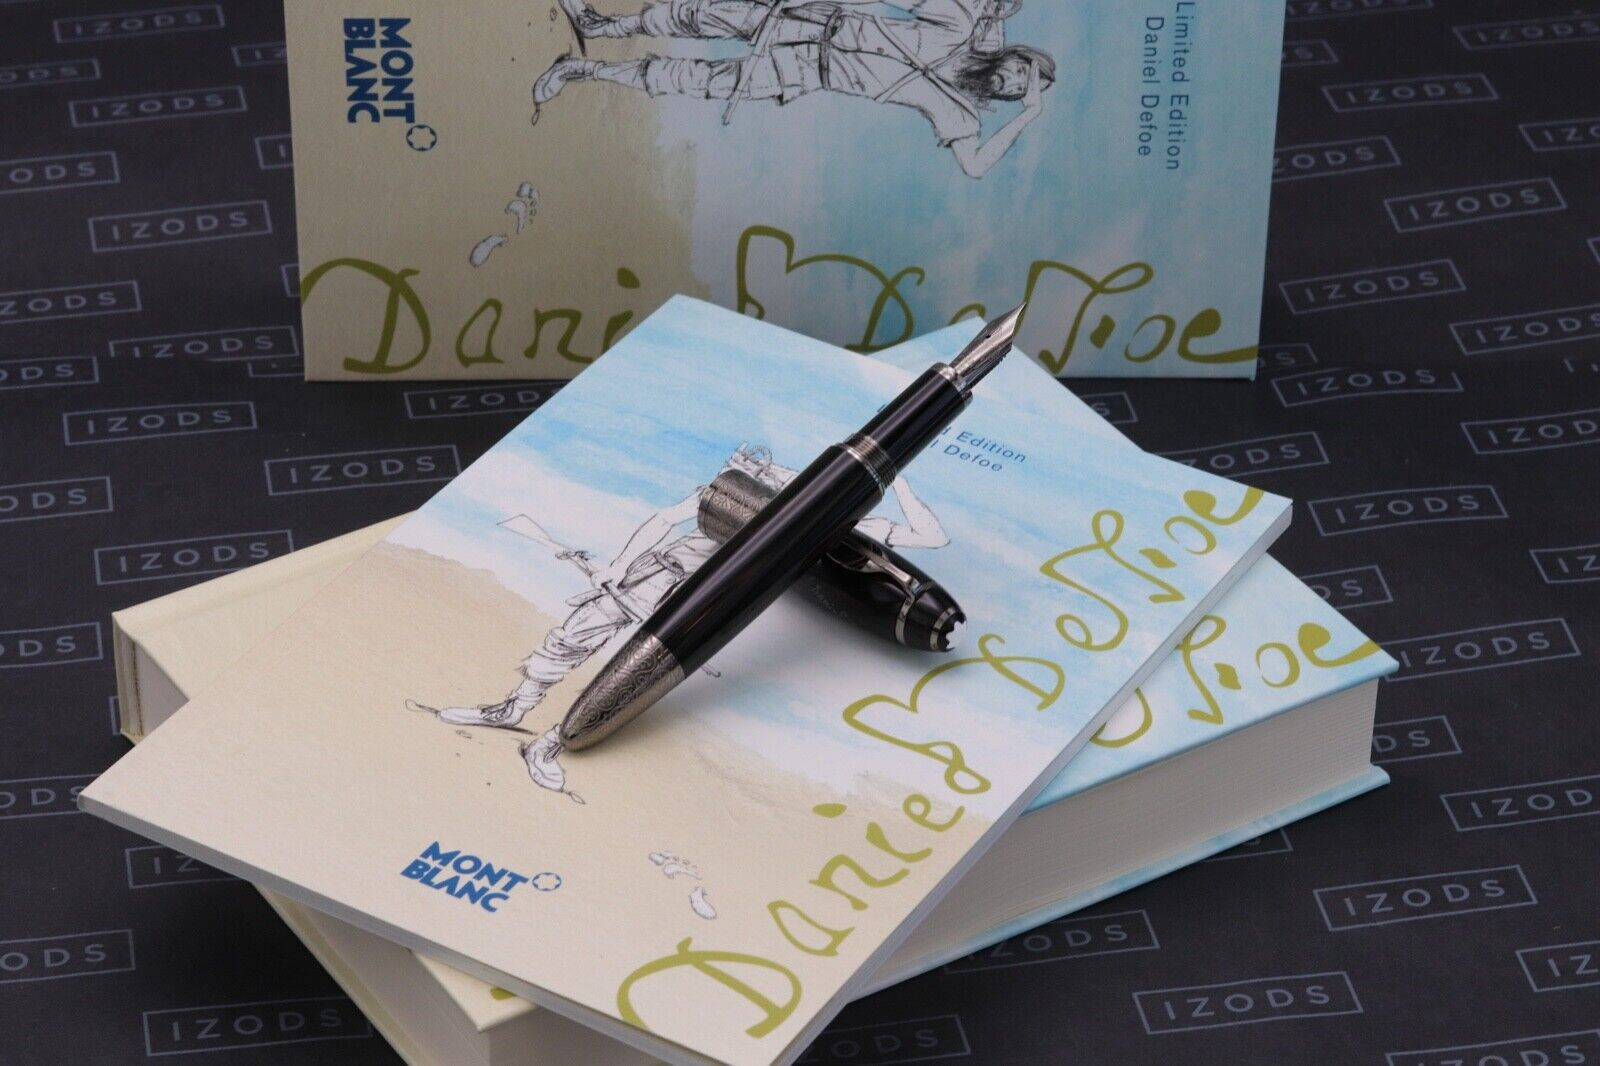 Montblanc Daniel Defoe Writers Limited Edition Fountain Pen - UNUSED